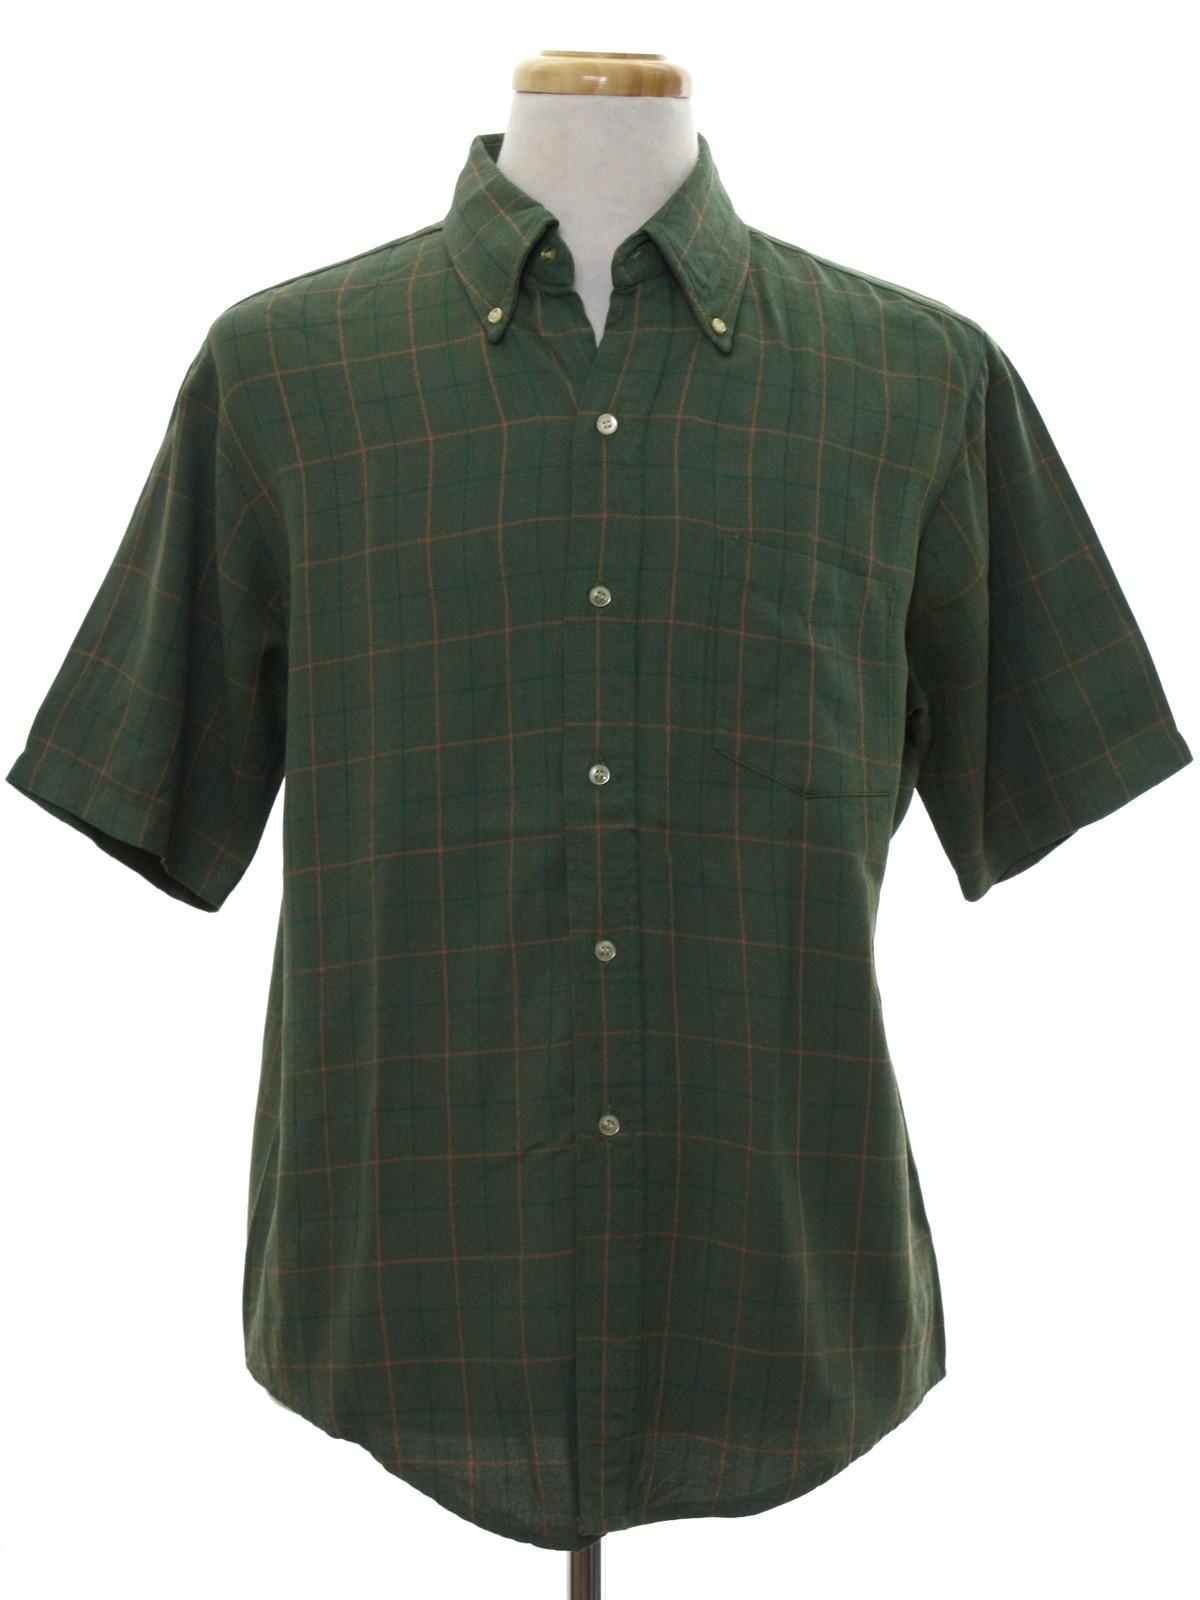 Vintage 60s Shirt Early 60s Kennington Form Fit Mens